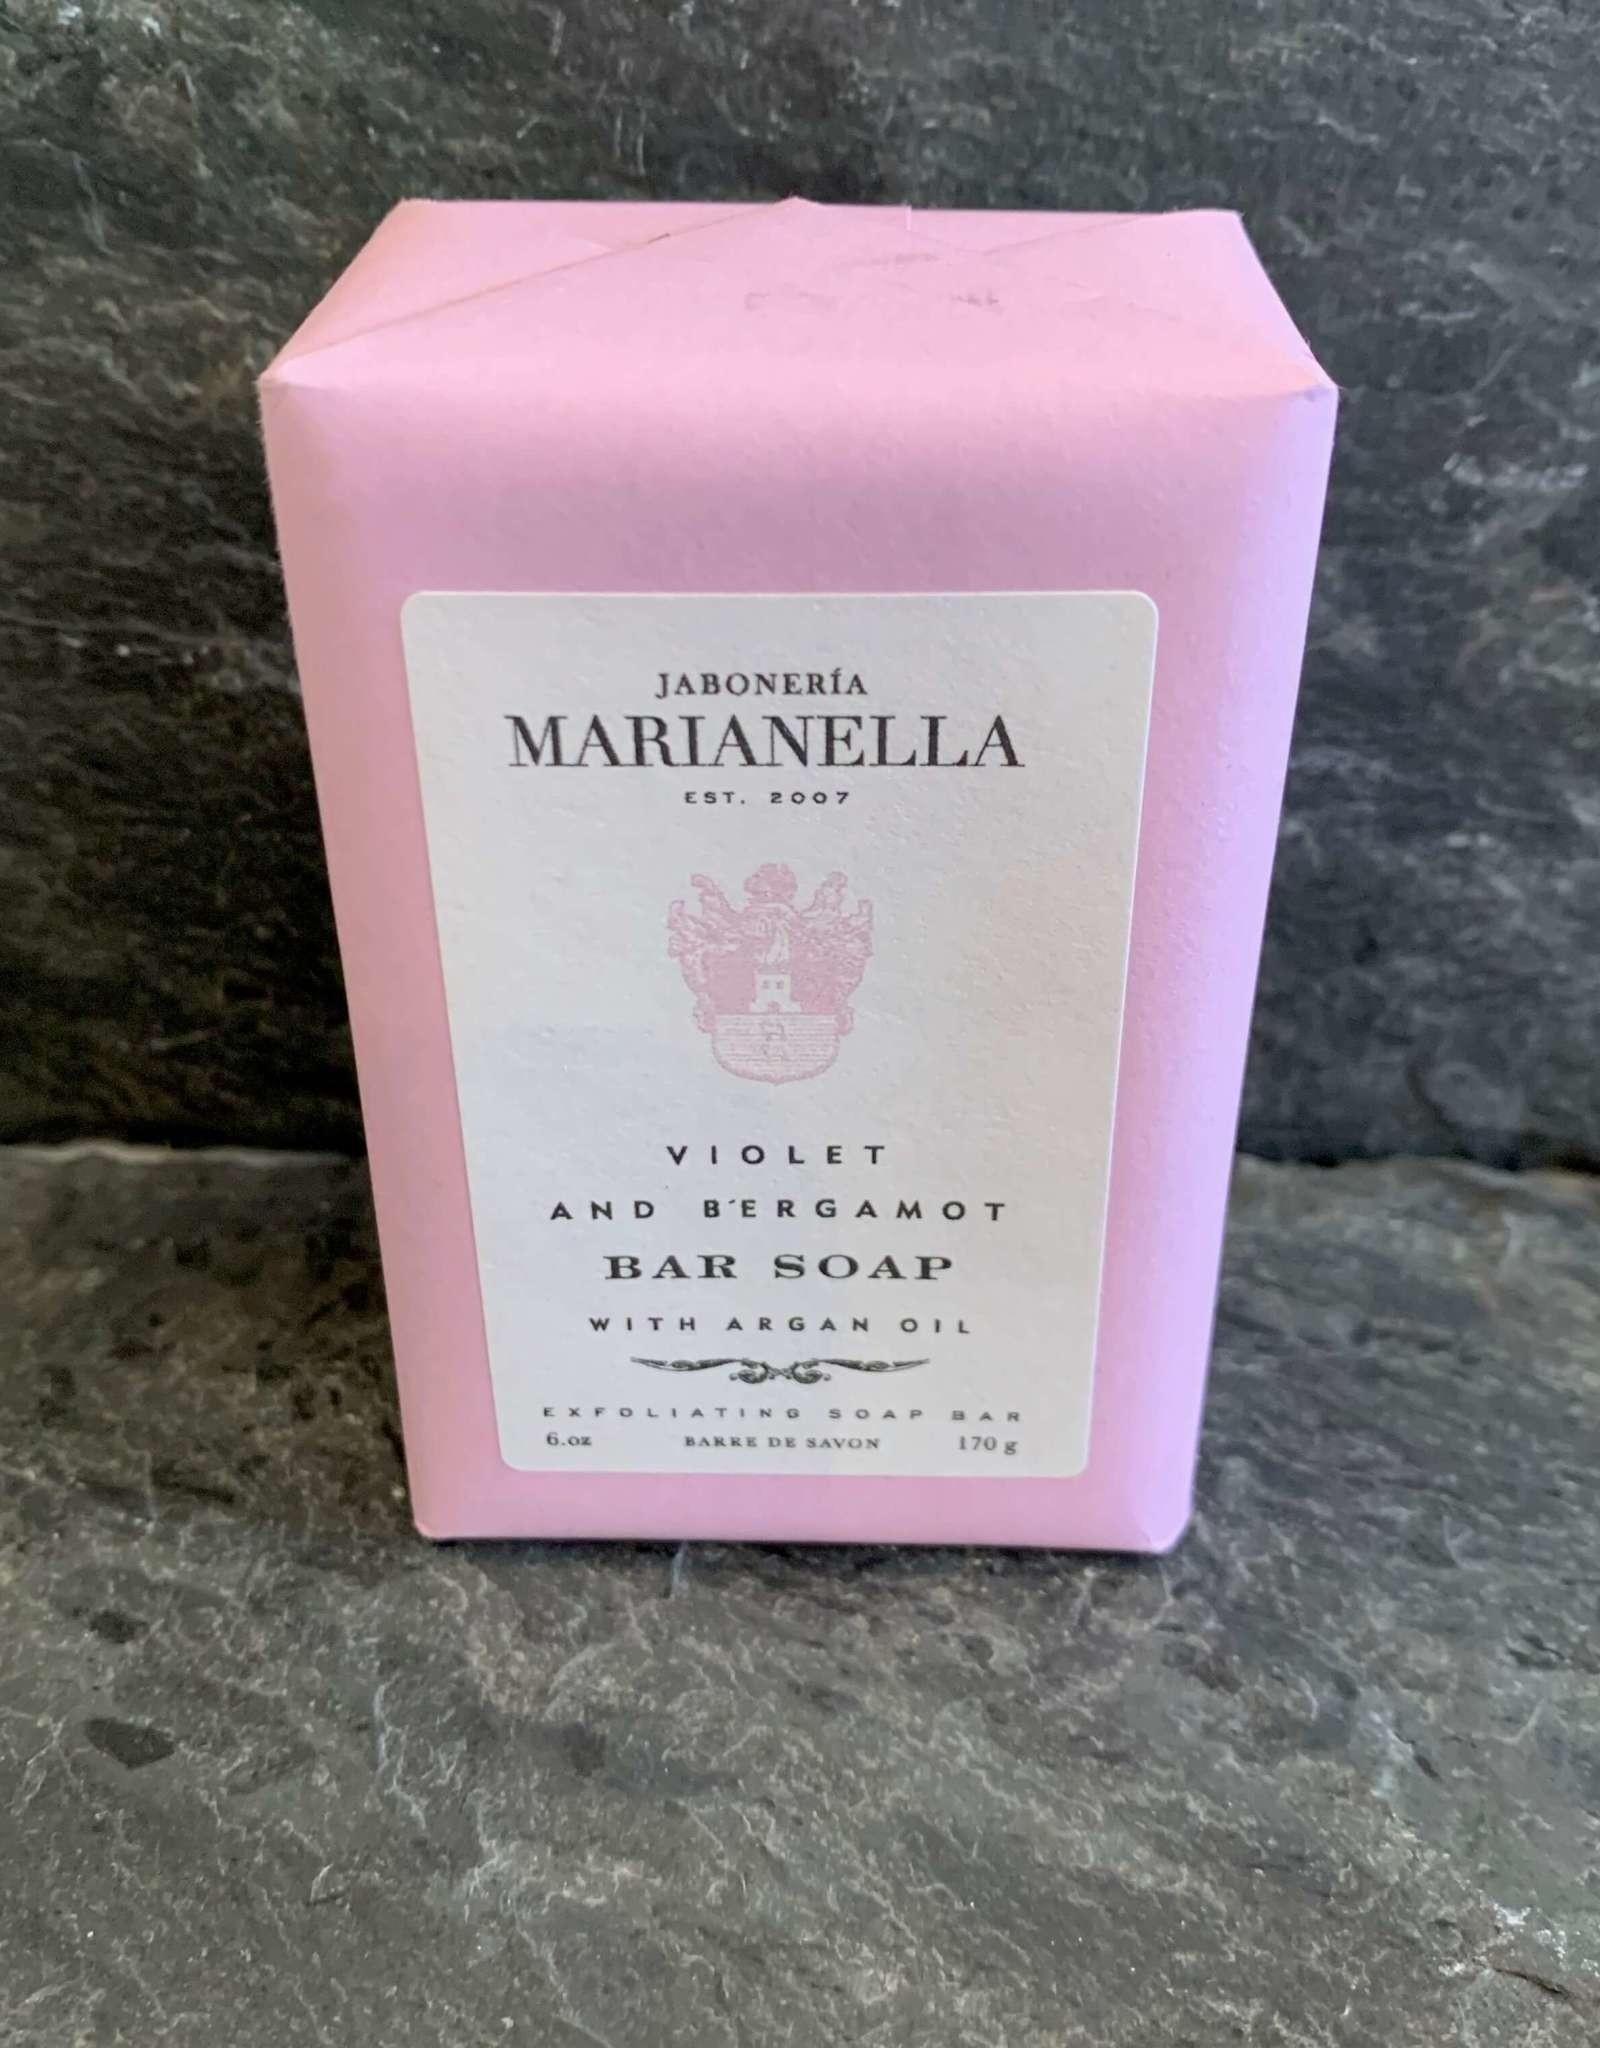 Marianella Jaboneria Marianella Violet & Bergamot Soap Bar